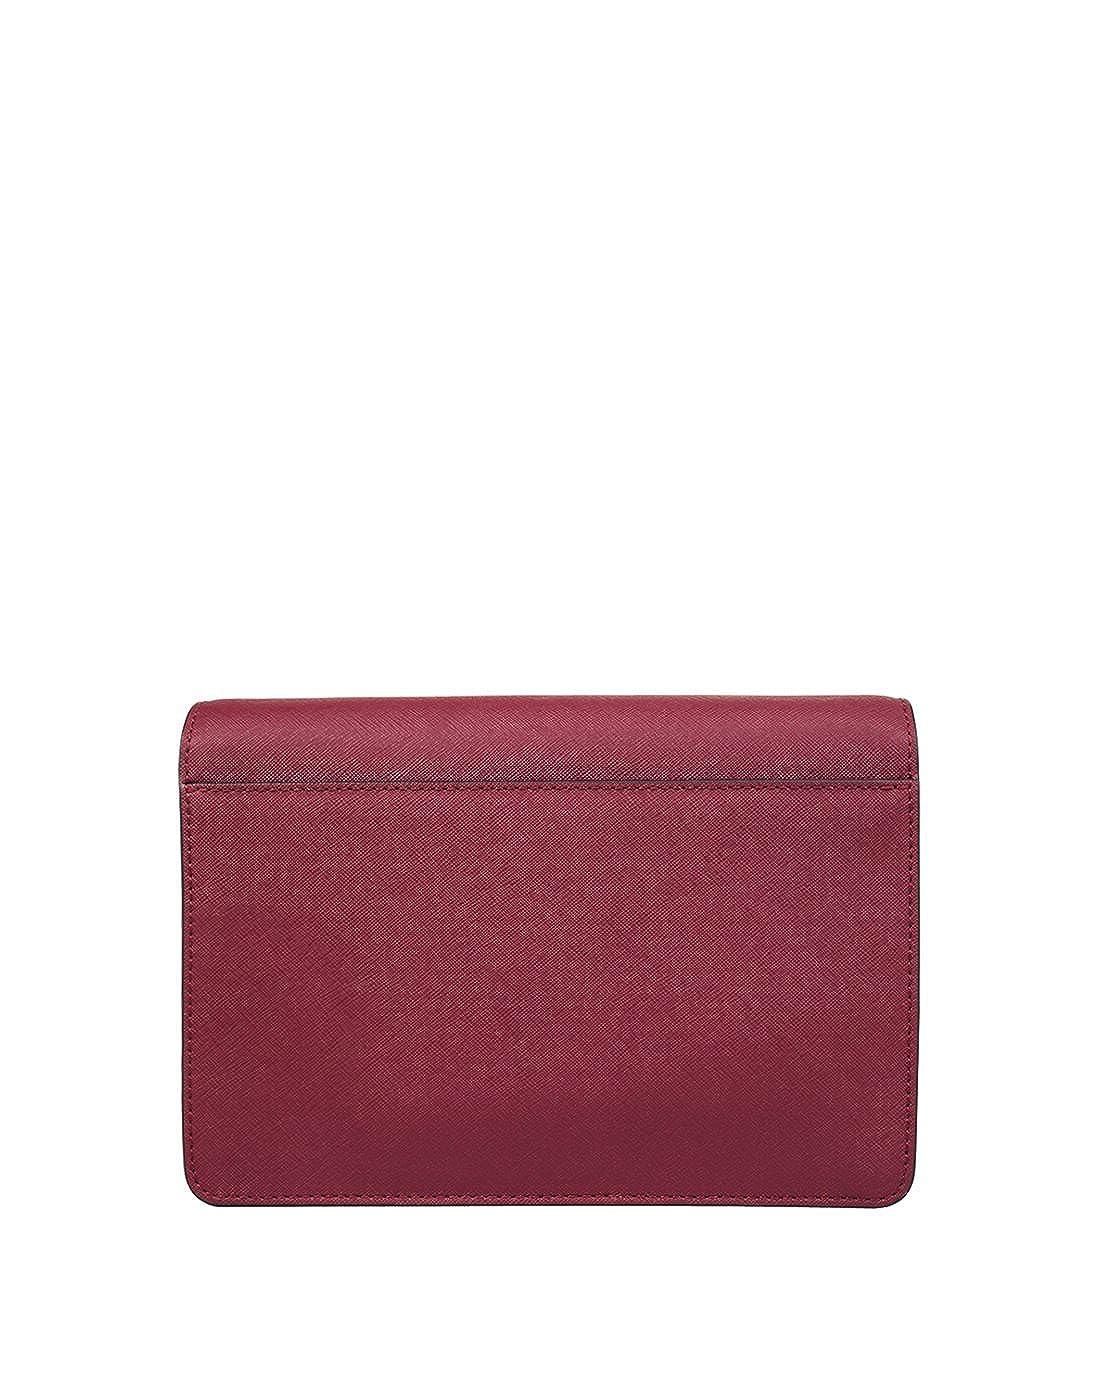 1bfedfdd335f2 Michael Kors Daniela Large Flap Gusset Crossbody Mulberry  Amazon.ca  Shoes    Handbags